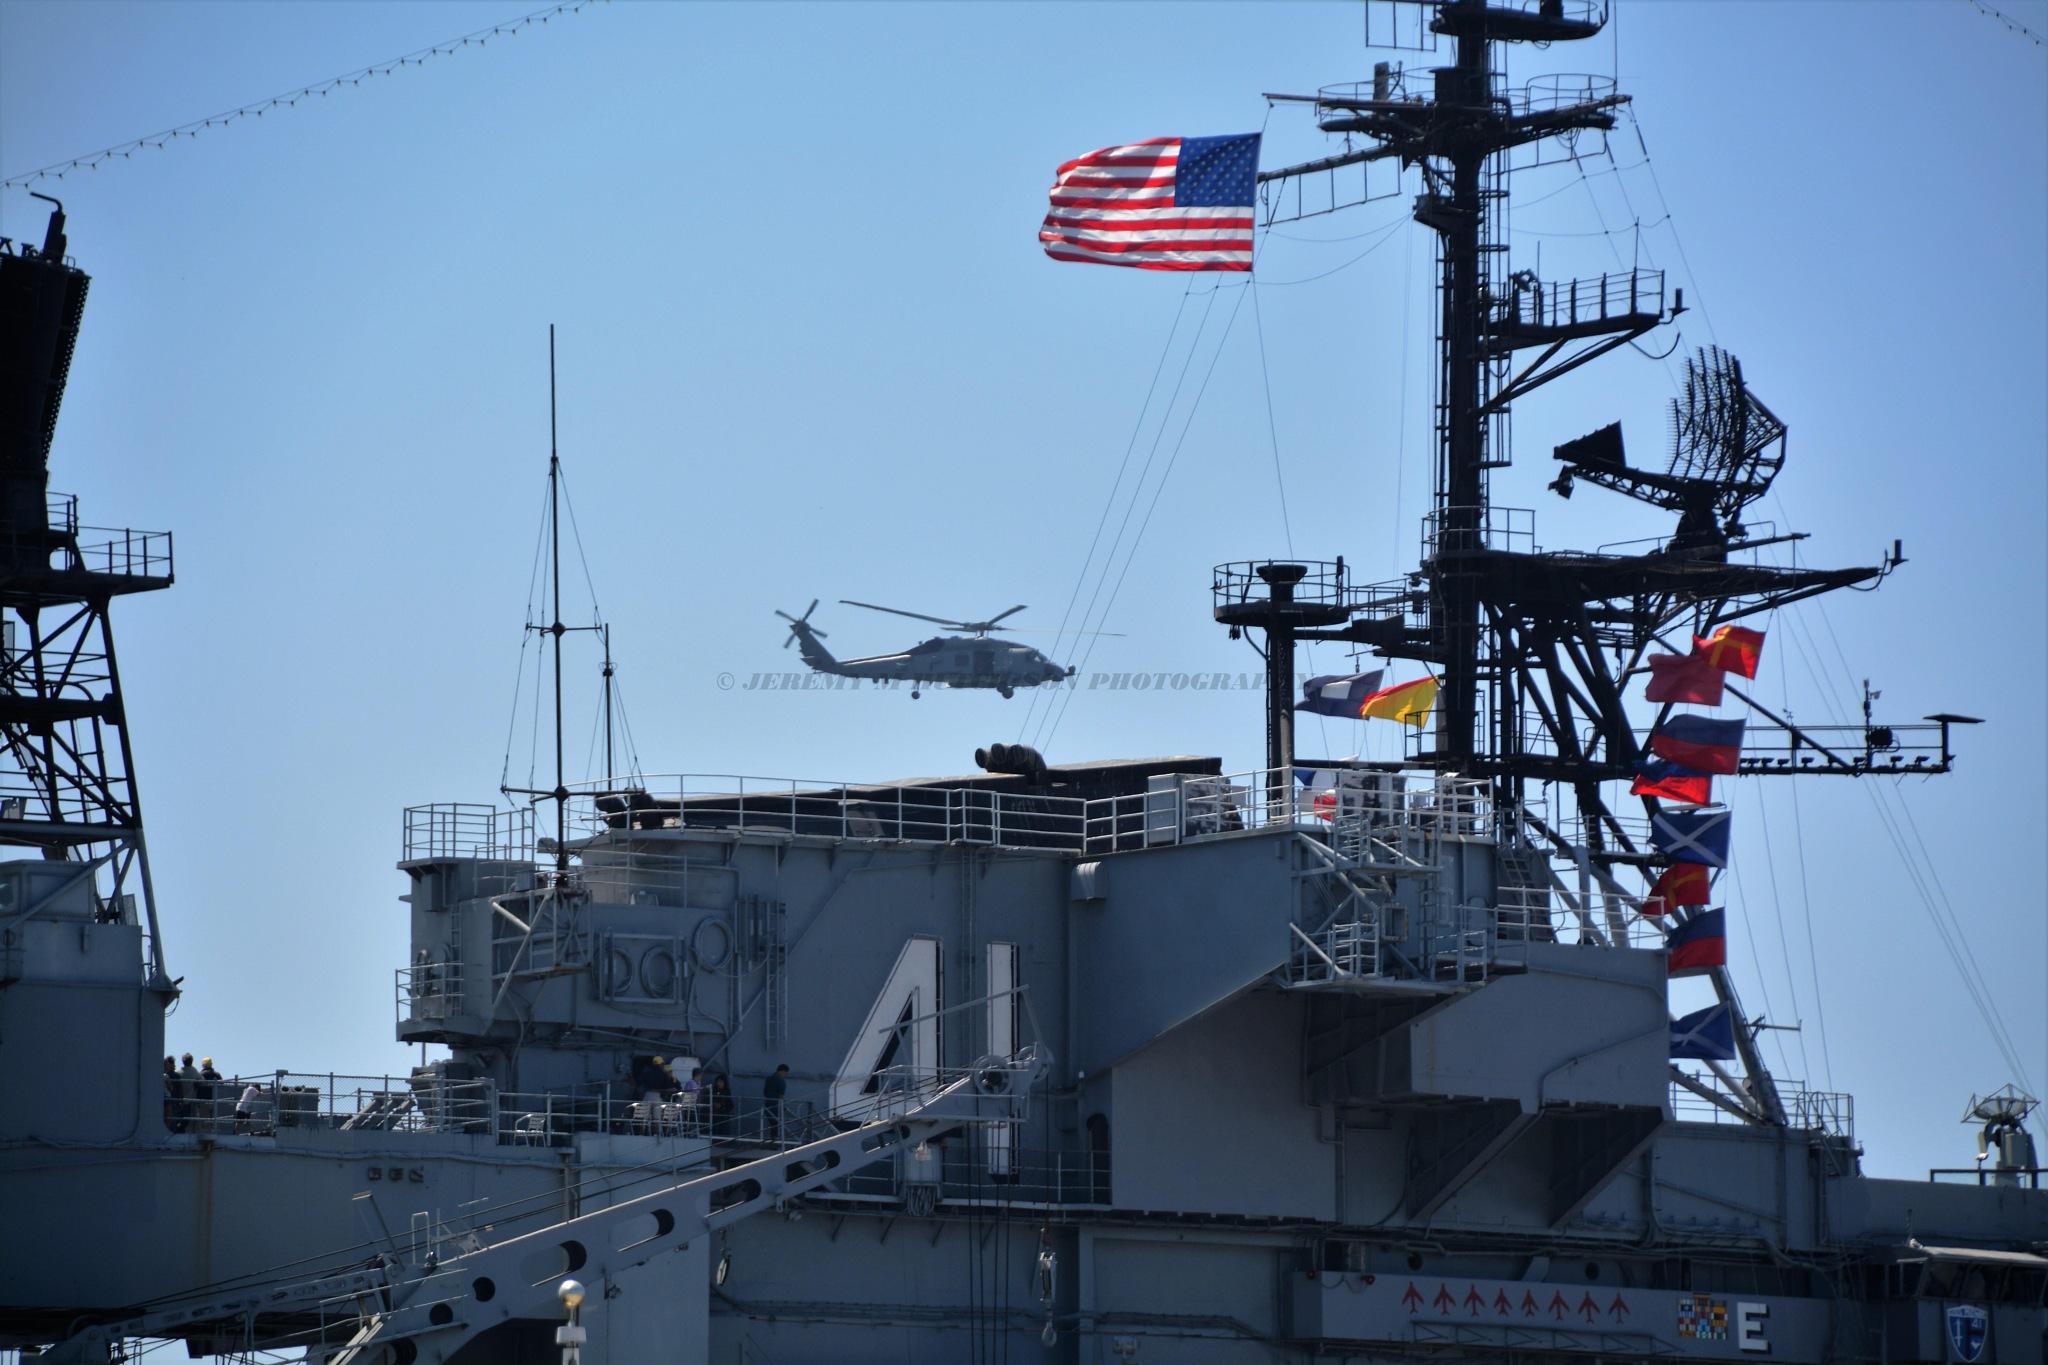 USS Midway San Diego Fleet Week by Jeremy M Hutchison